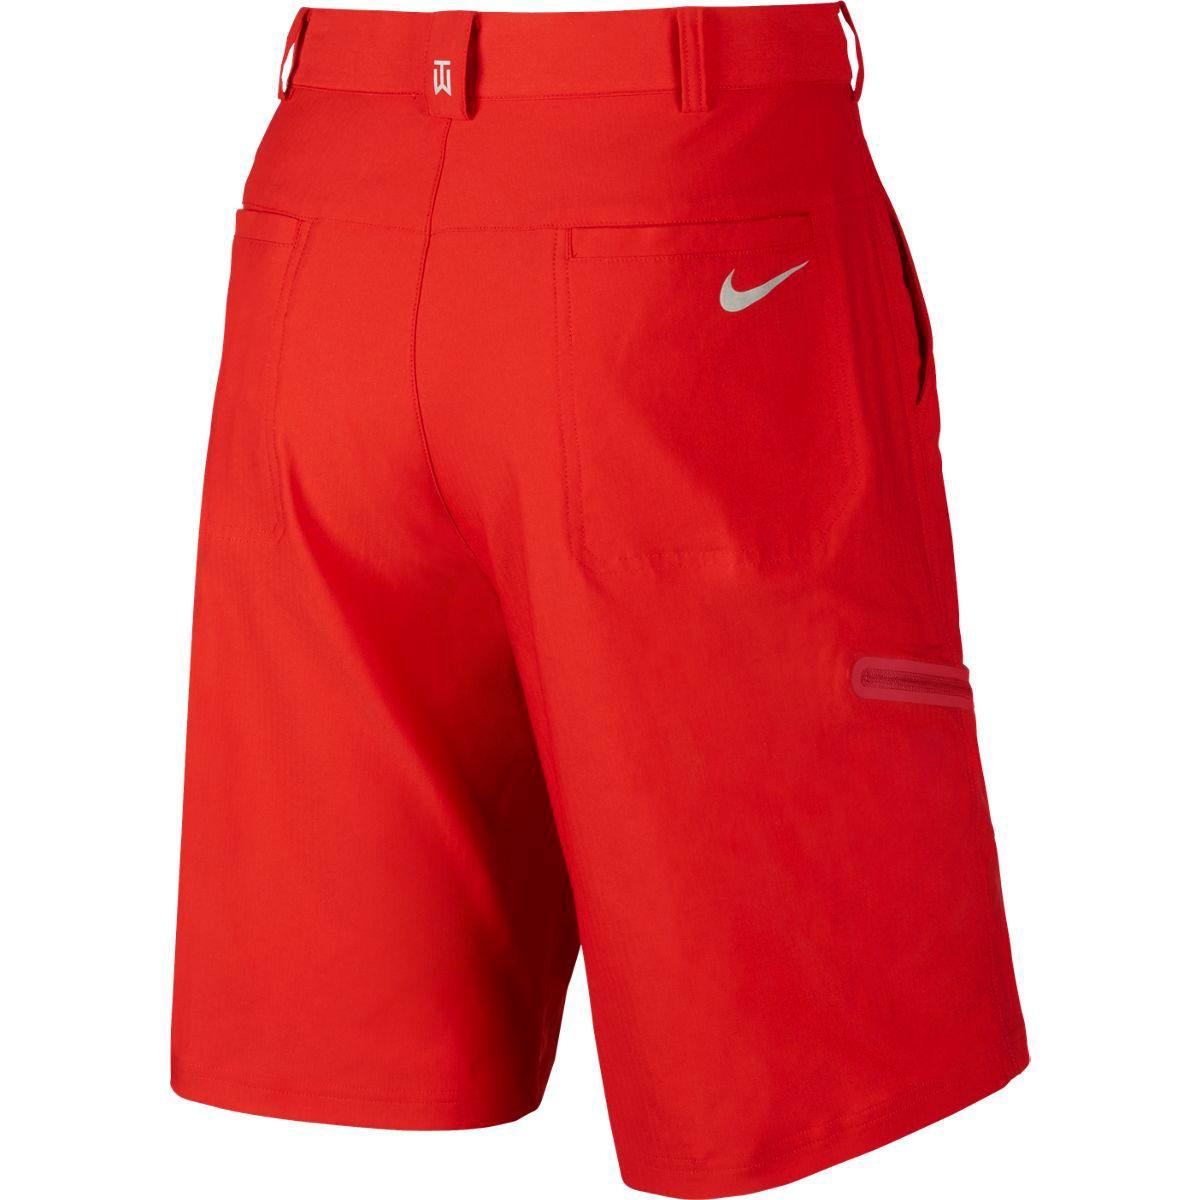 mens shorts style photo - 1